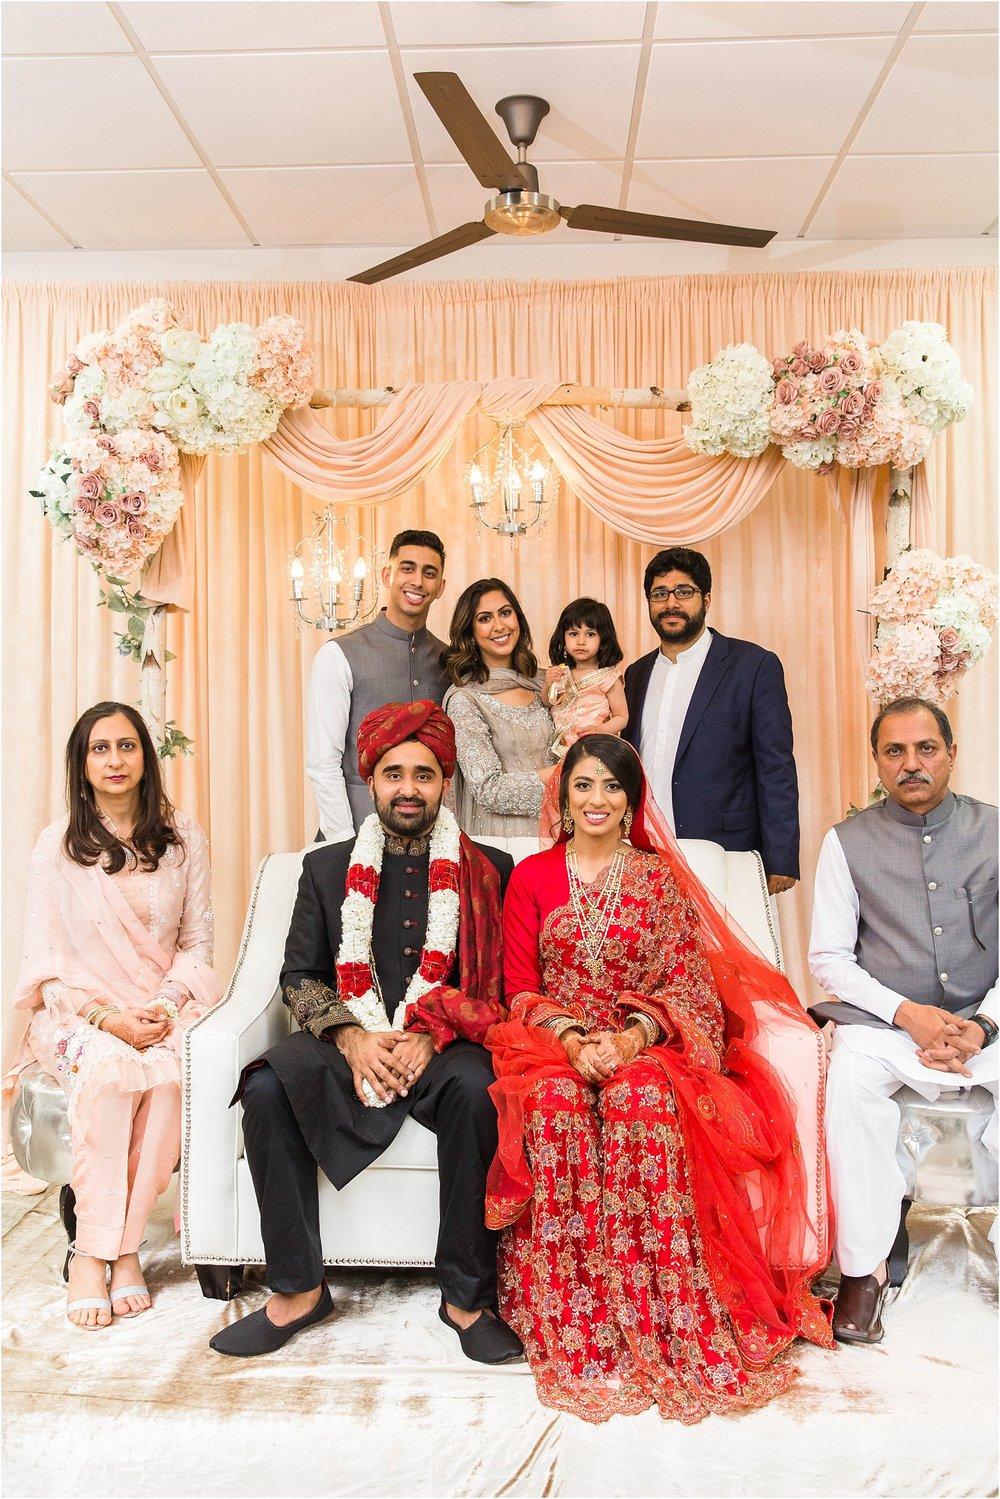 Jame-Masjid-Coopers-Mosque-Kariya-Park-Cherry-Blossoms-Wedding-Toronto-Mississauga-Brampton-Scarborough-GTA-Pakistani-Indian-Wedding-Engagement-Photographer-Photography_0044.jpg